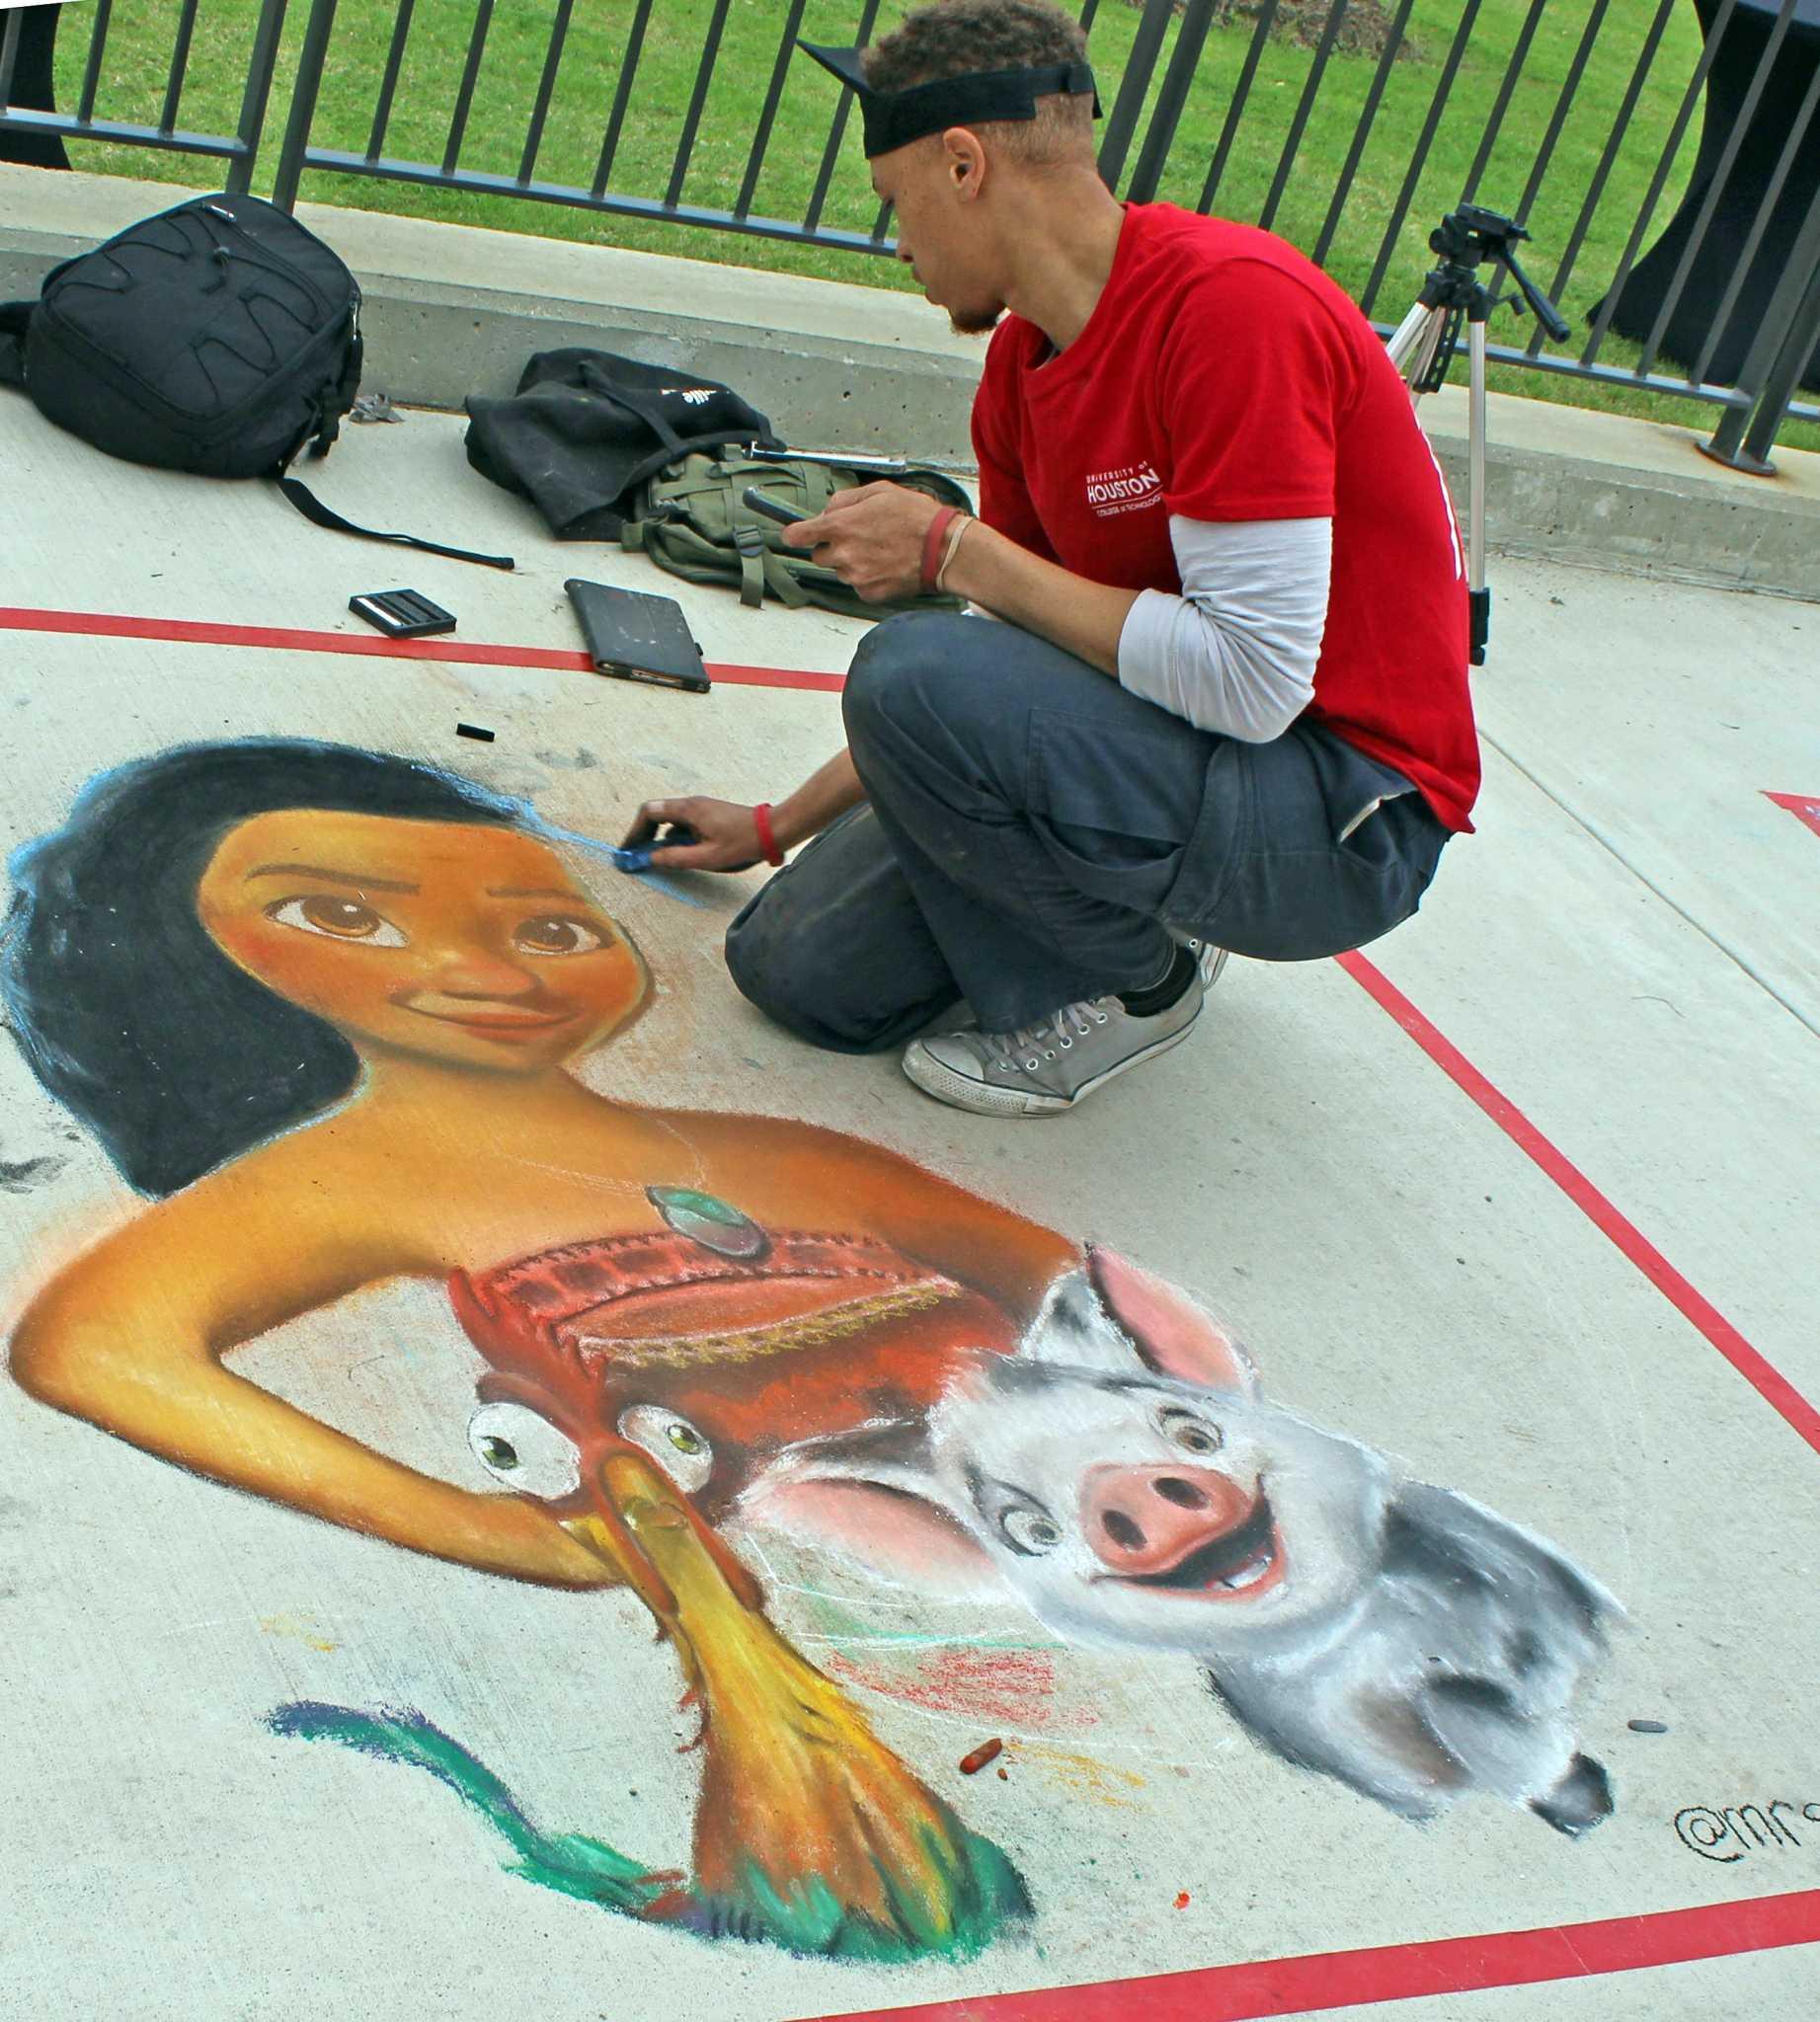 Sugar Land Chalk Art Competition Deadline Extended Until Aug